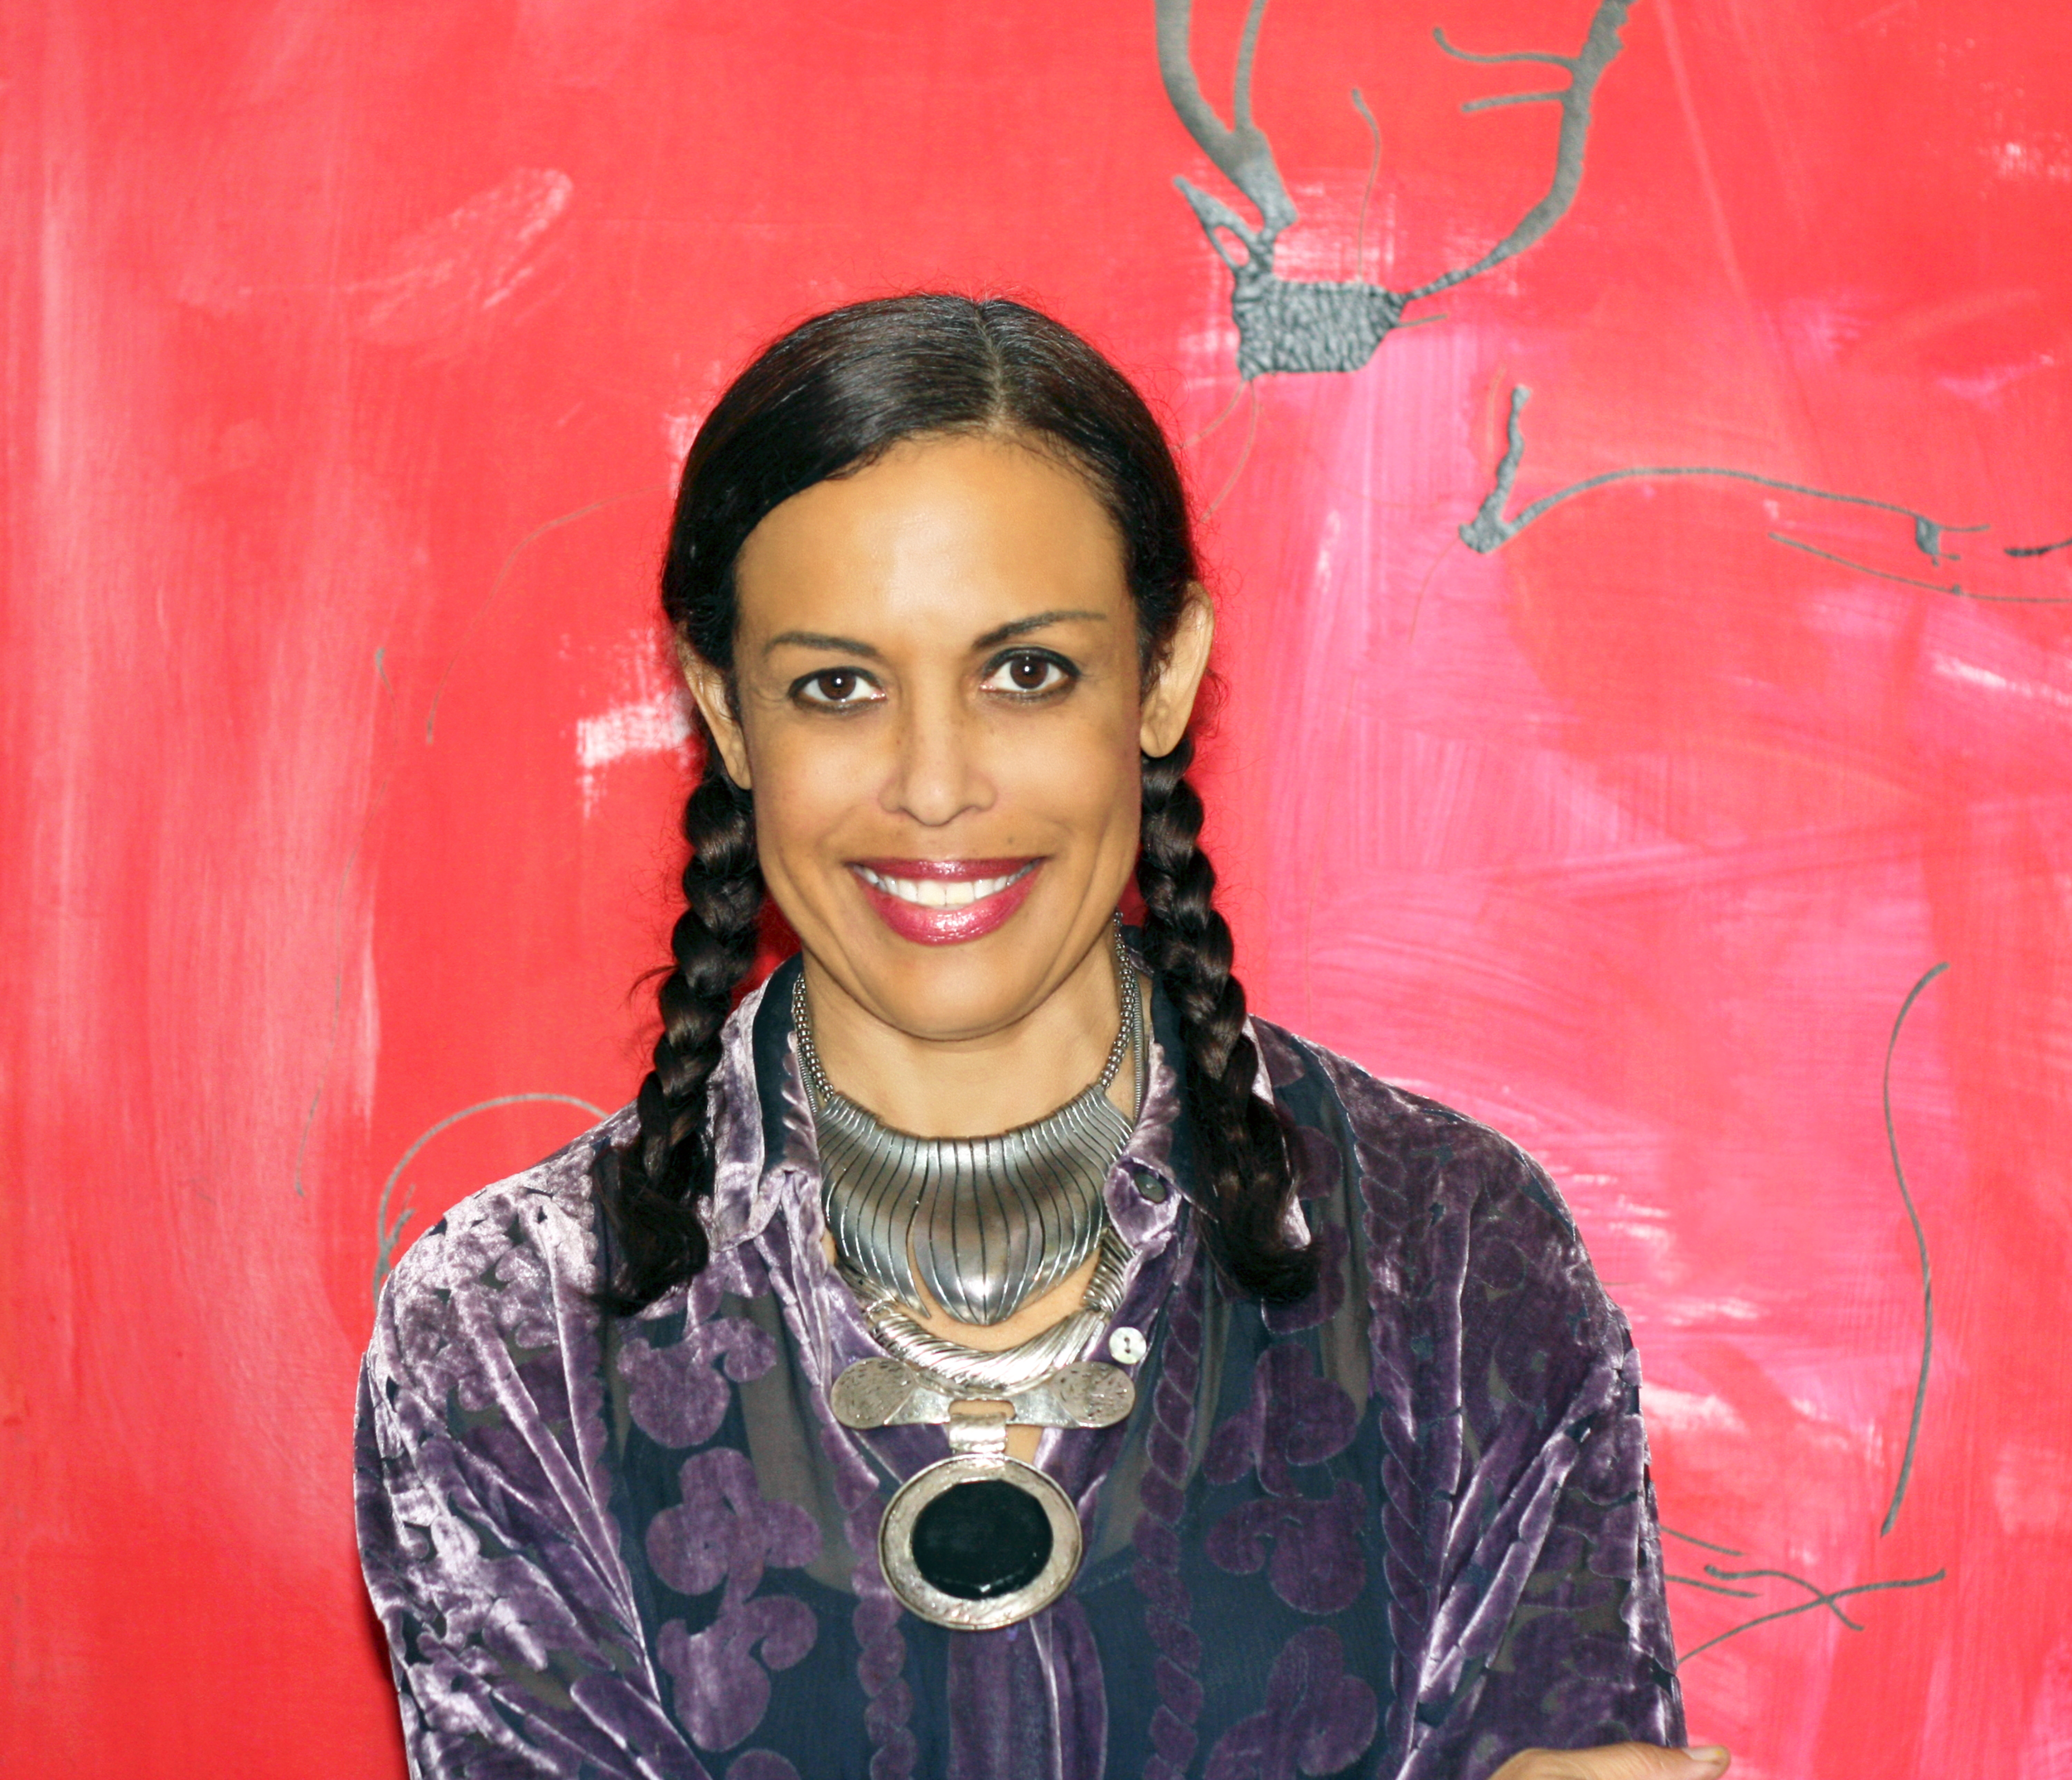 Toni Scott, image courtesy of the artist